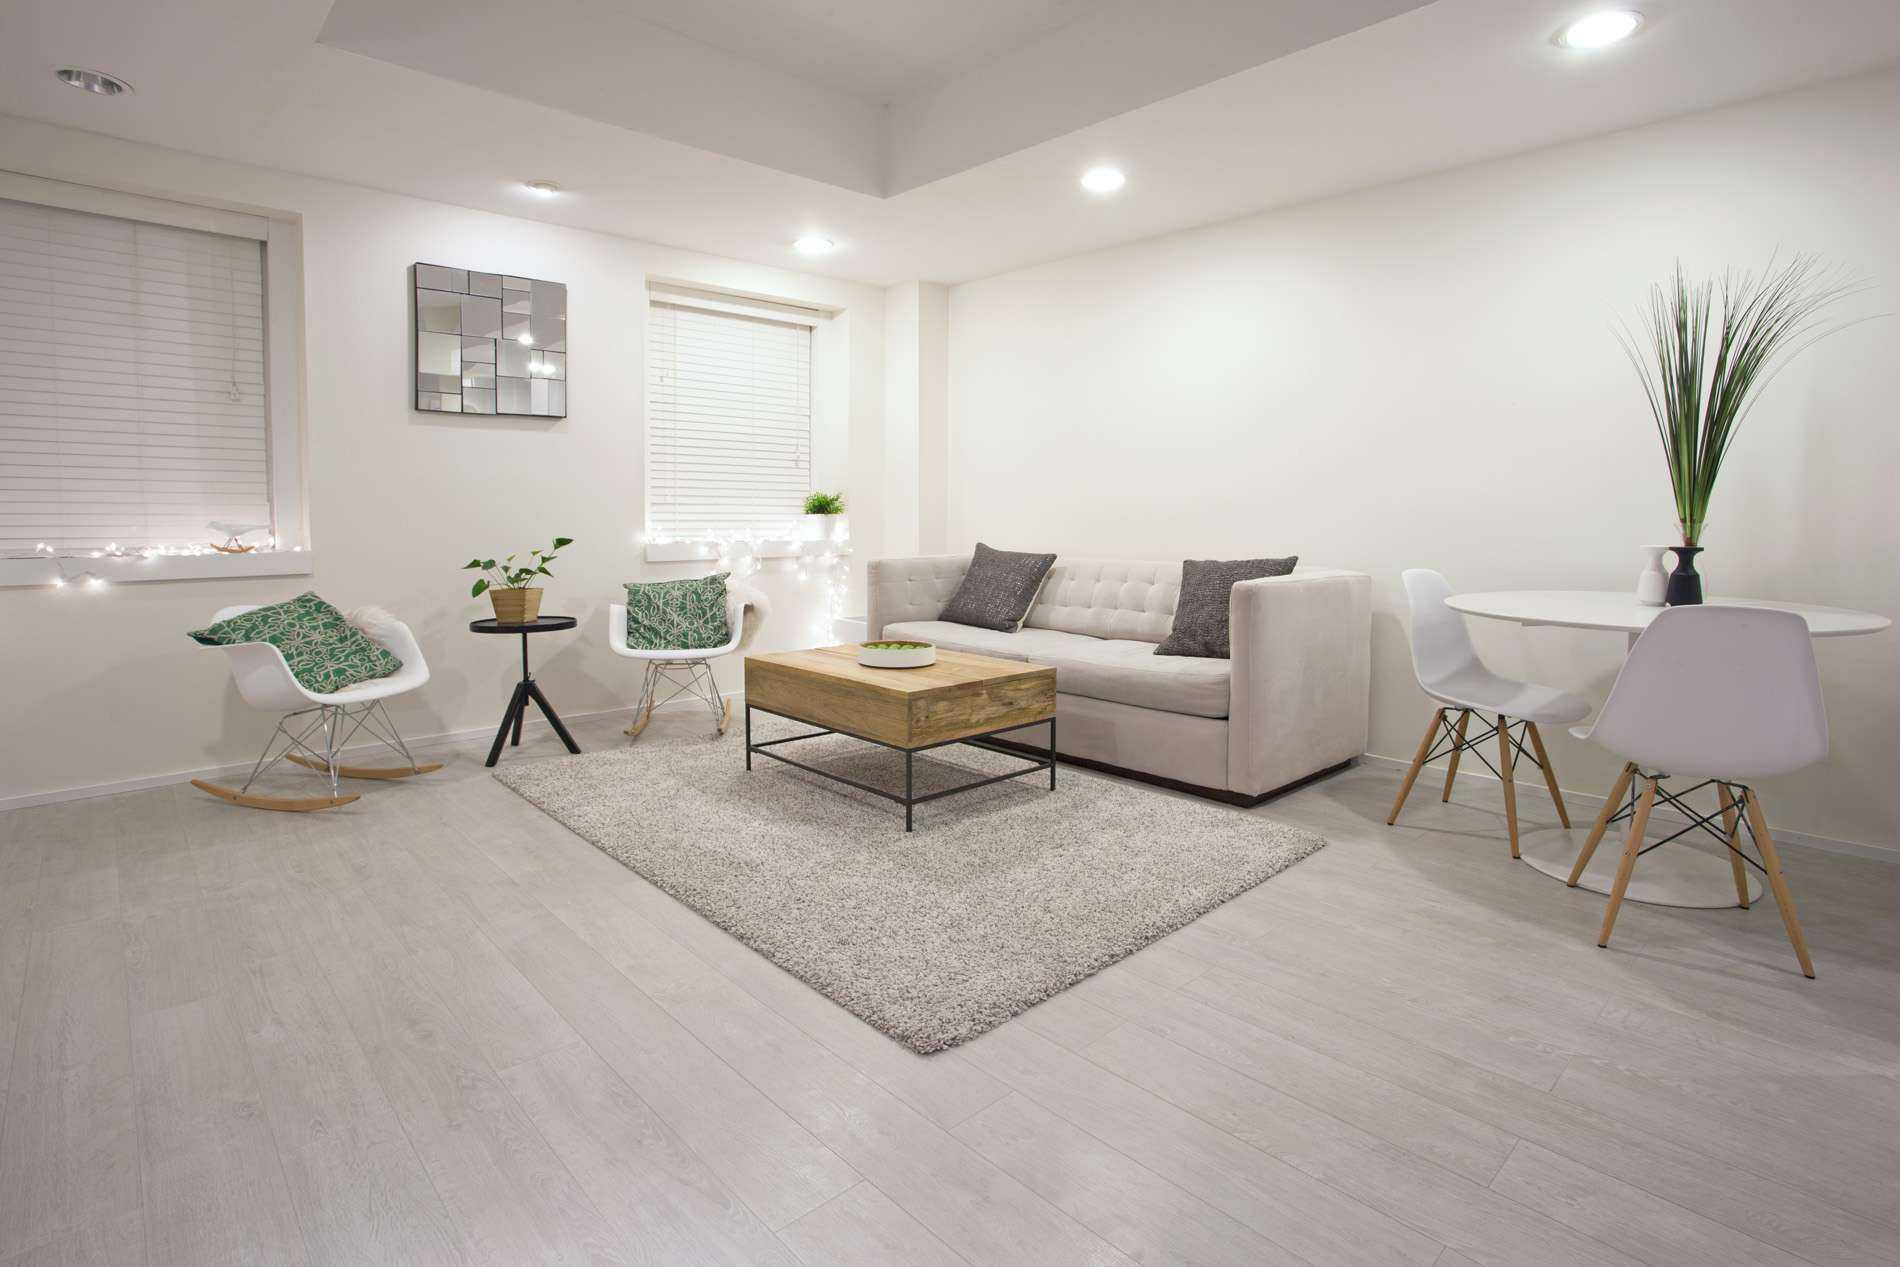 sablage teinture finition planchers montr al ouest. Black Bedroom Furniture Sets. Home Design Ideas